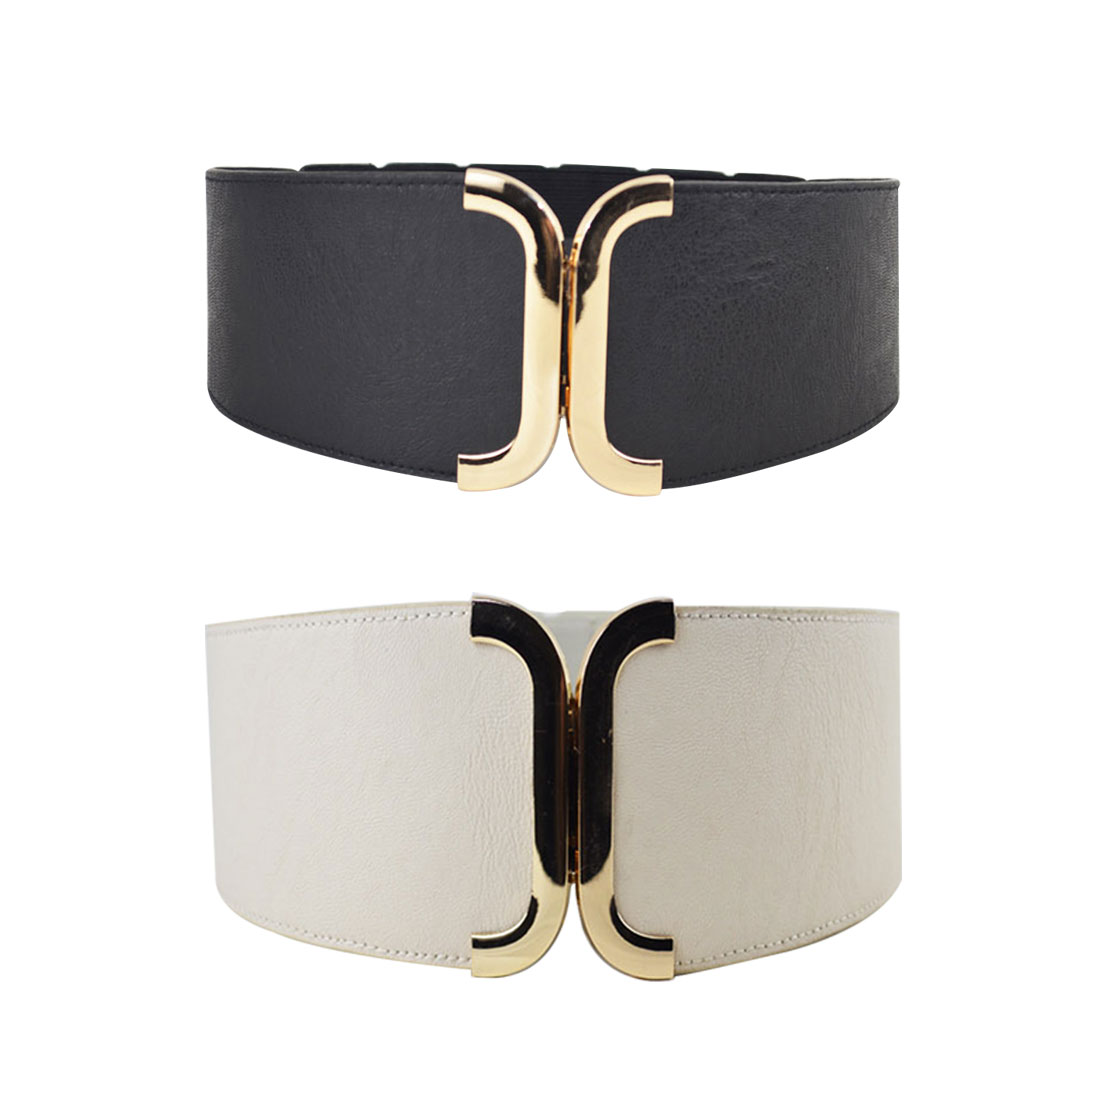 Charming Women Brief Belt Female Wide Belt Decoration Elastic Fashion Cummerbund Strap All-Match Lady'S Waist Belts For Women